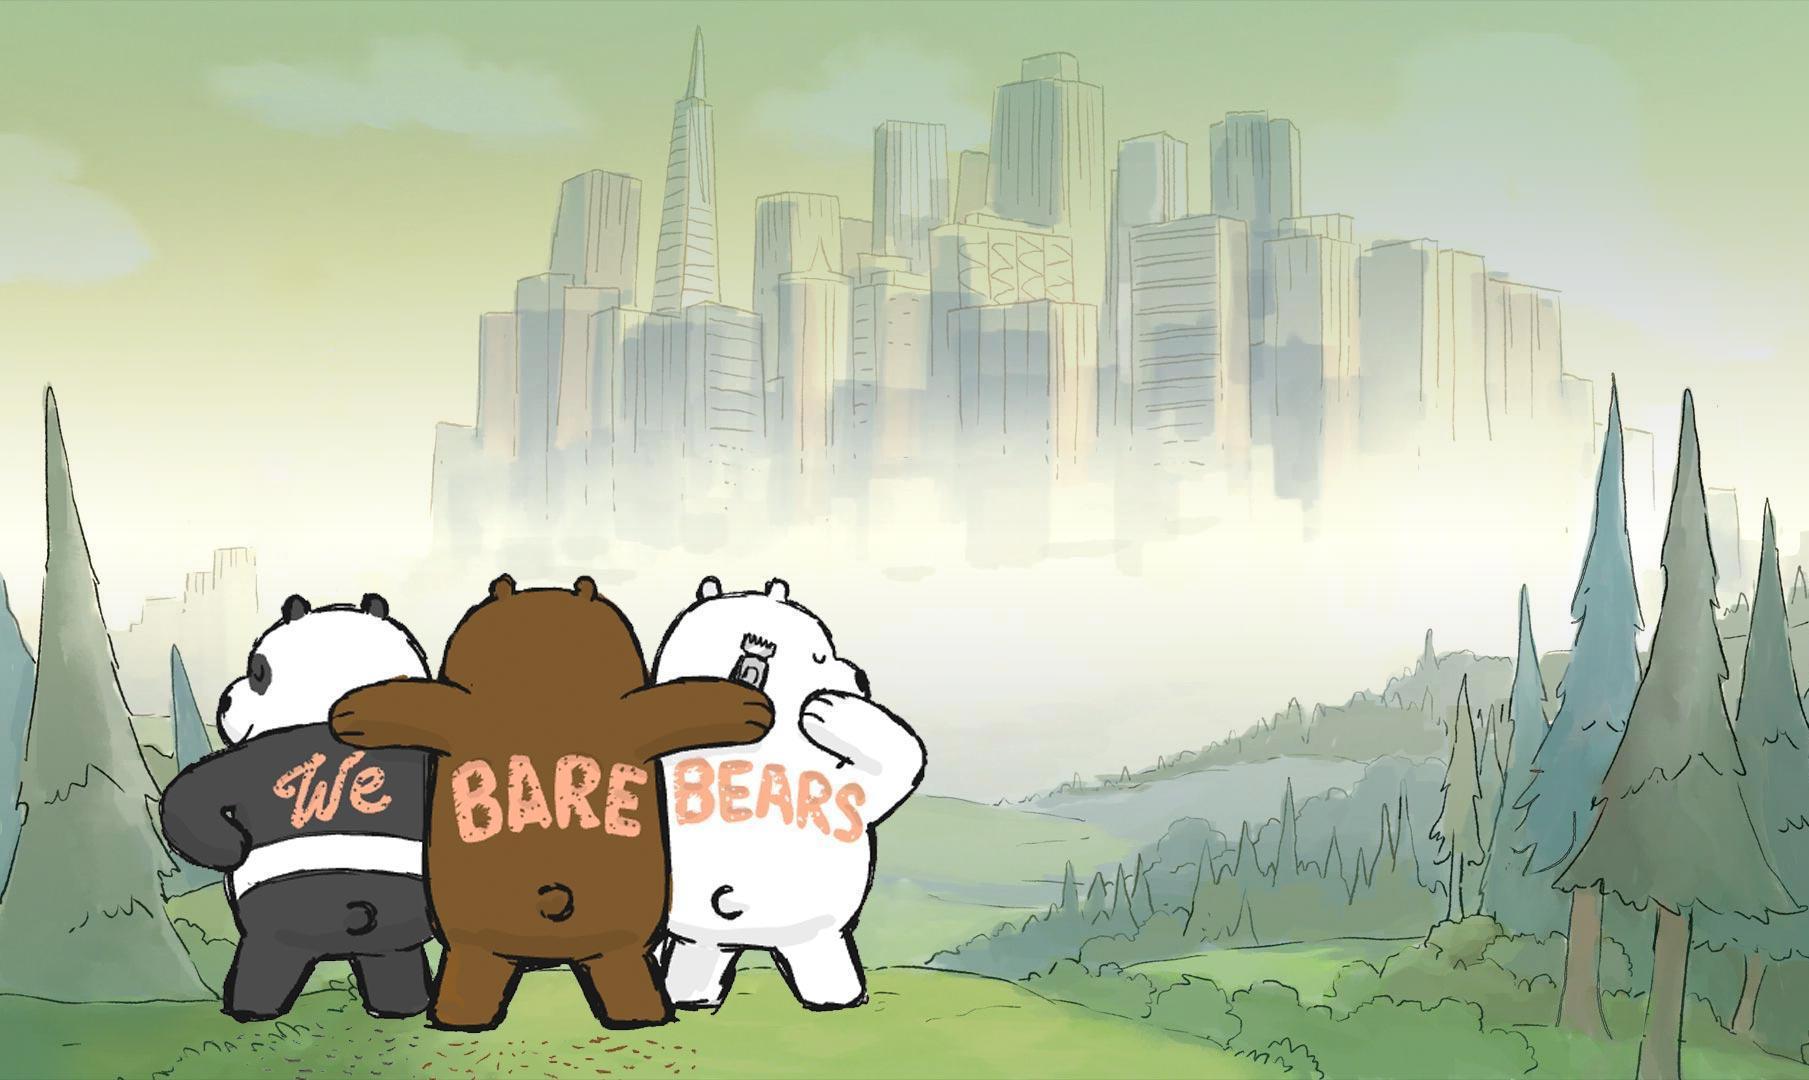 we bare bears christmas wallpaper - photo #36